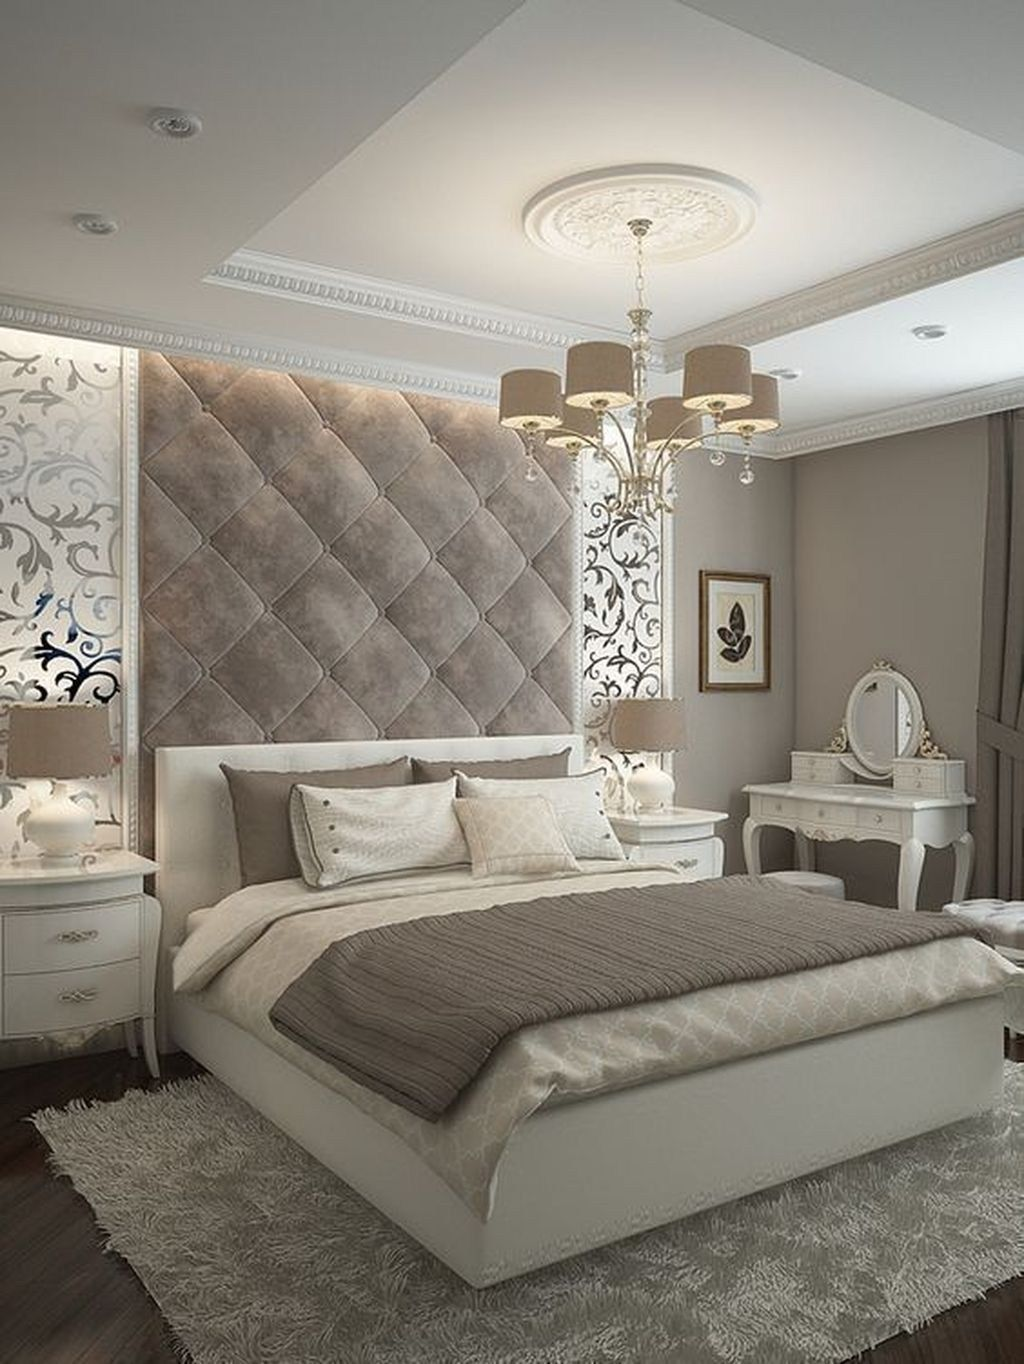 20+ Fancy Bedroom Design Ideas To Get Quality Sleep ...